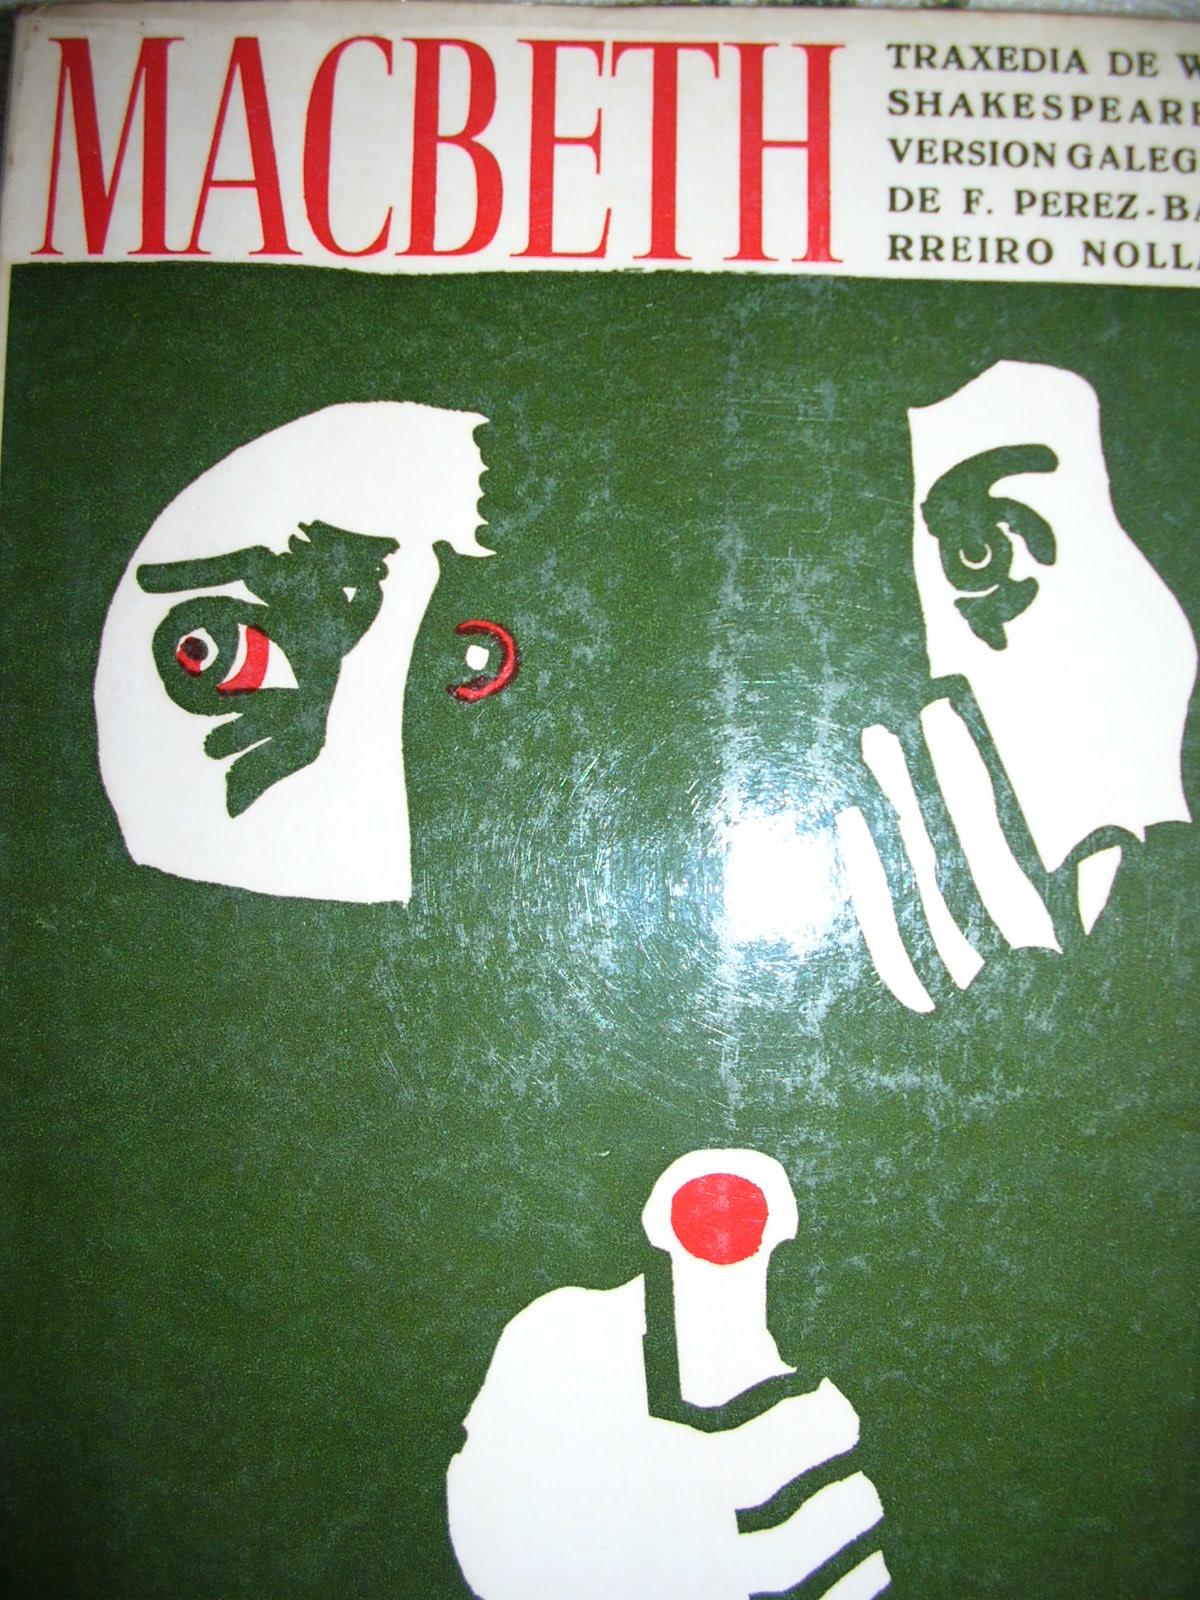 A traxedia de Macbeth